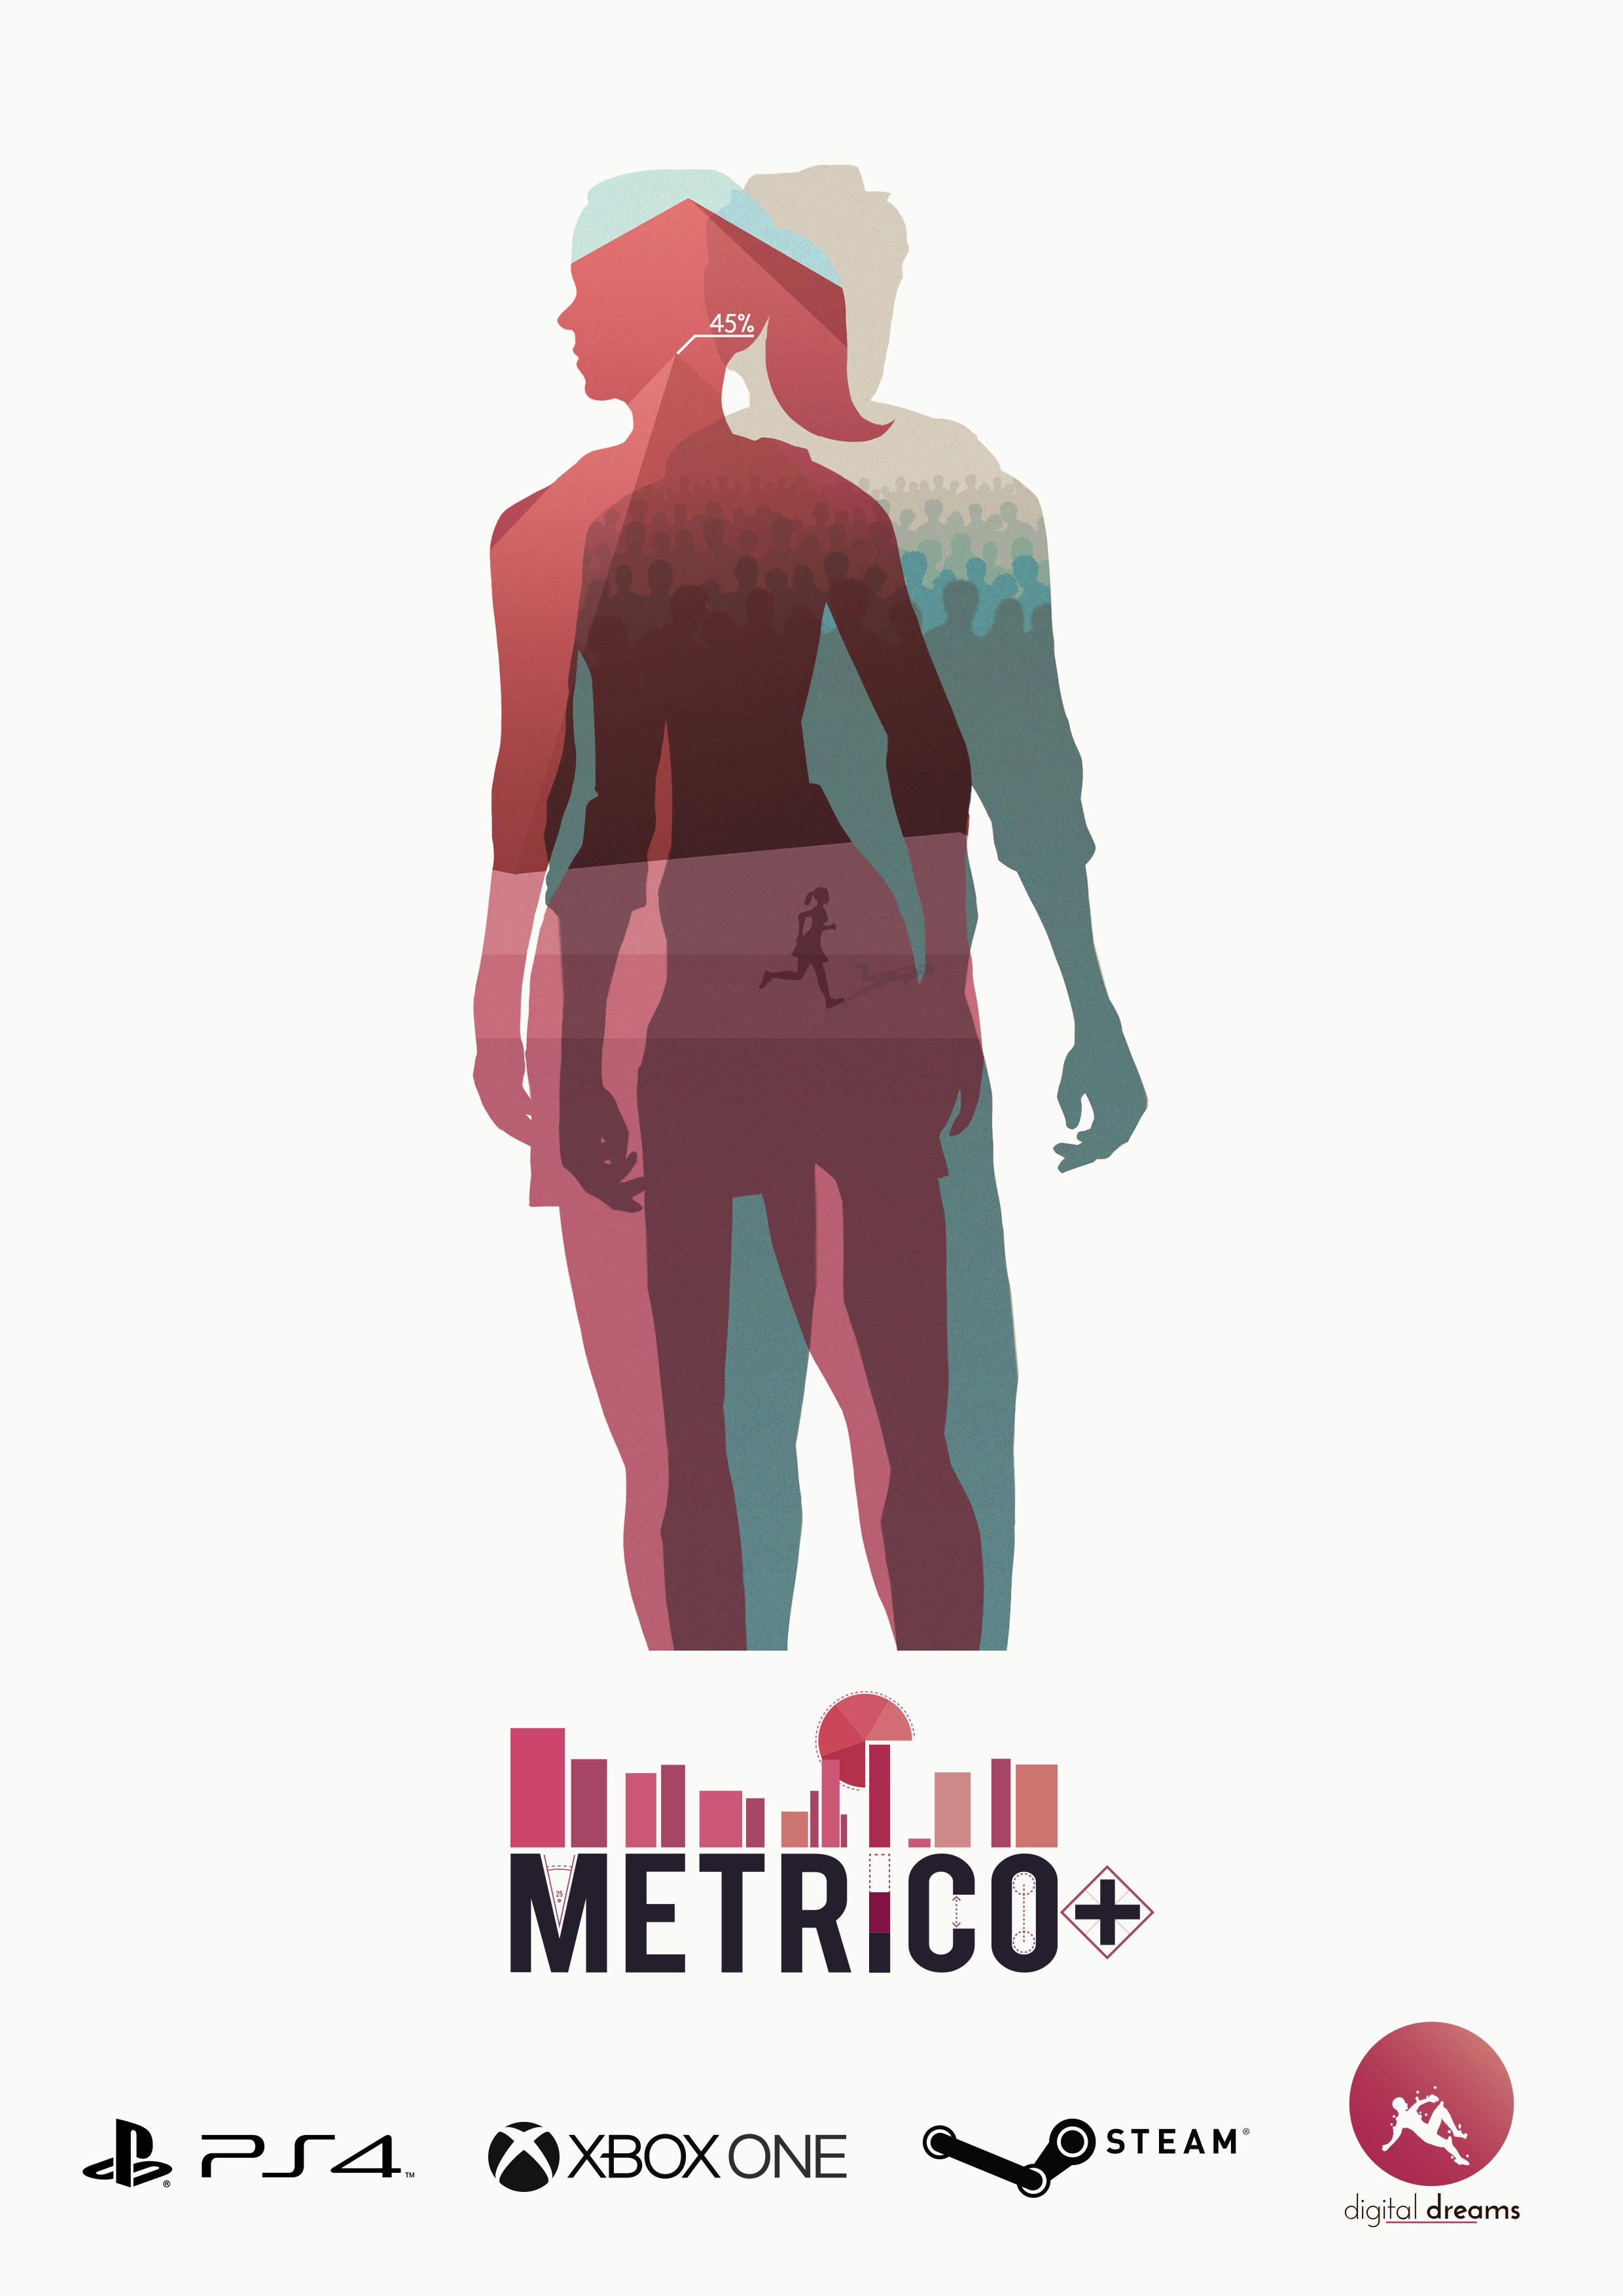 Metrico+_promo_art